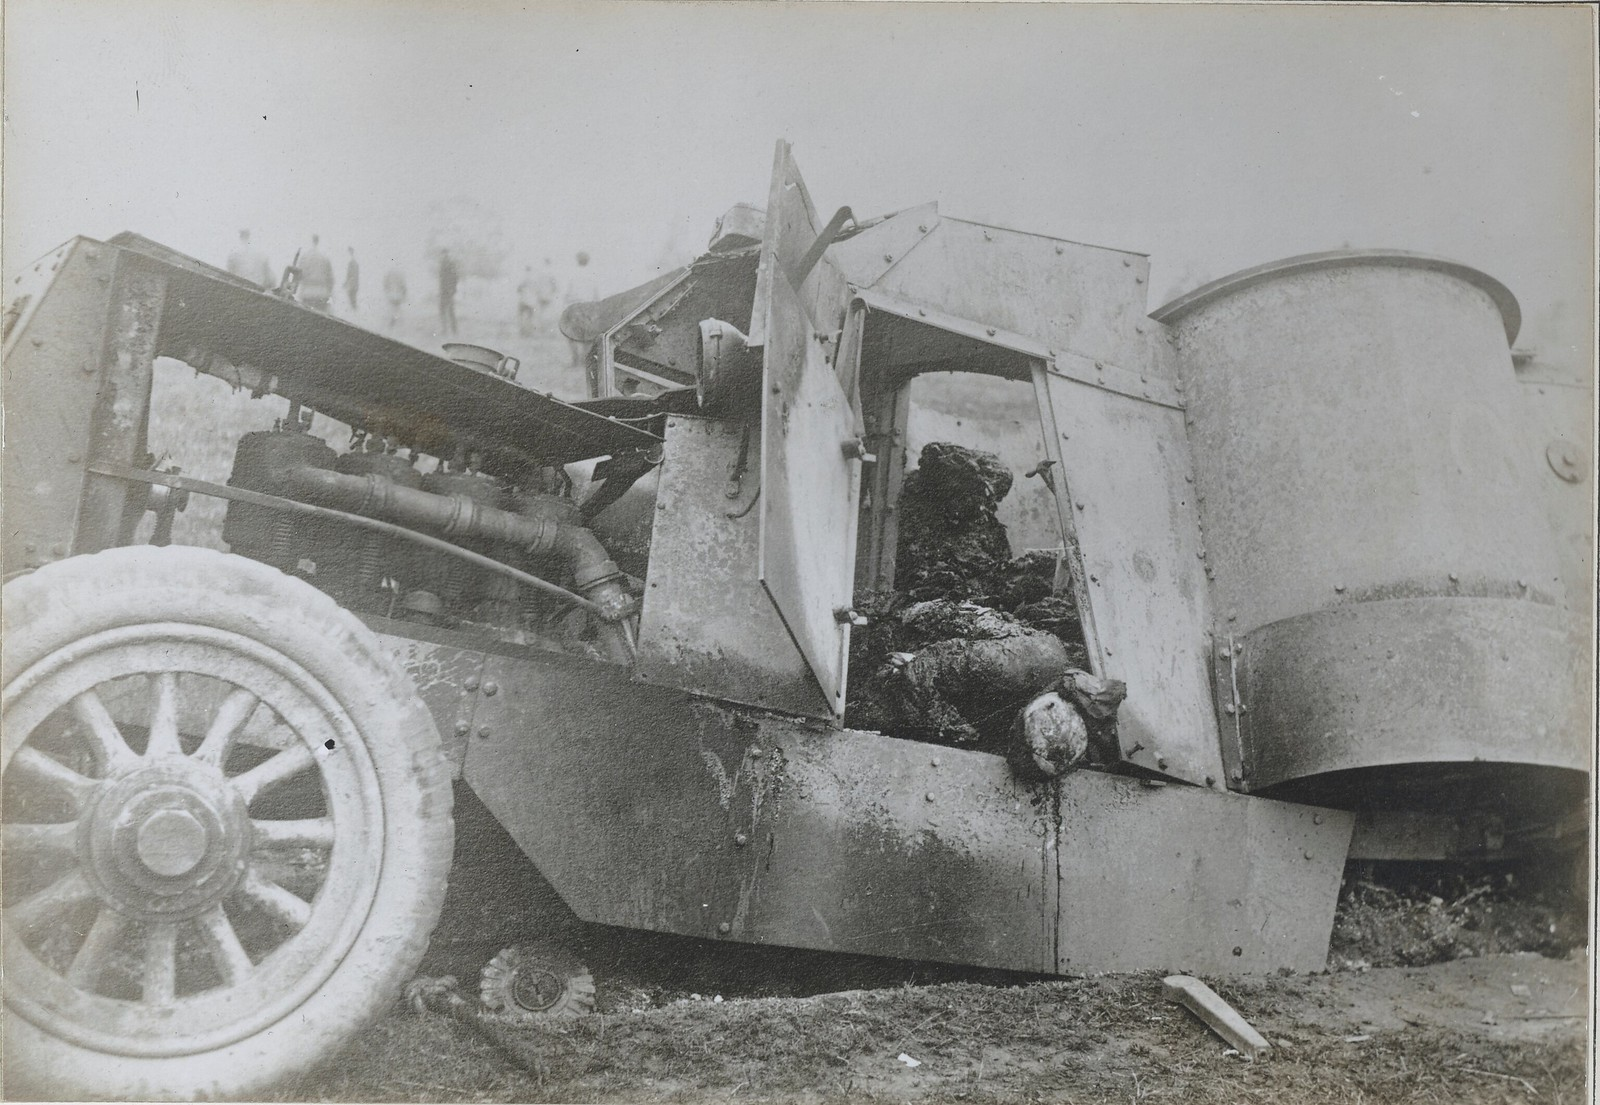 1917. Остин 9 бронедивизиона. Уничтожен в августе в боях под Тарнополем